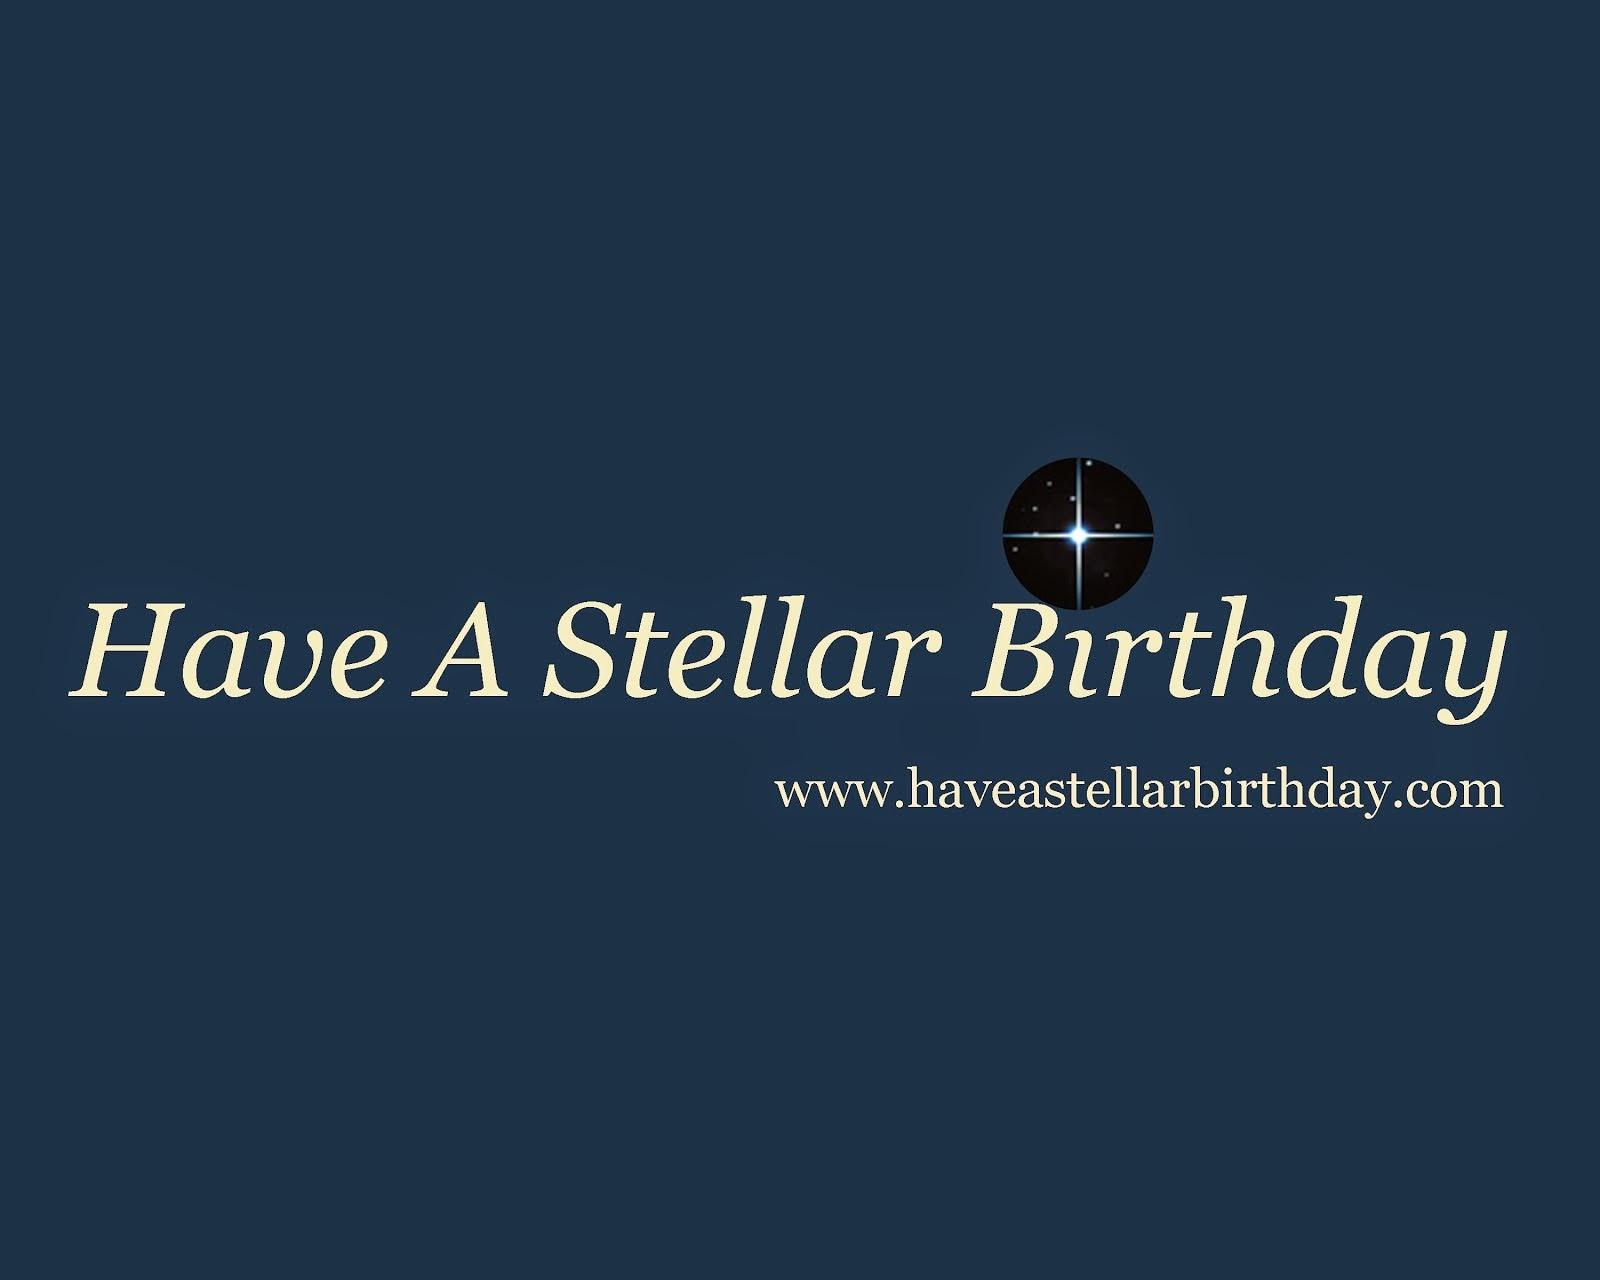 Have A Stellar Birthday